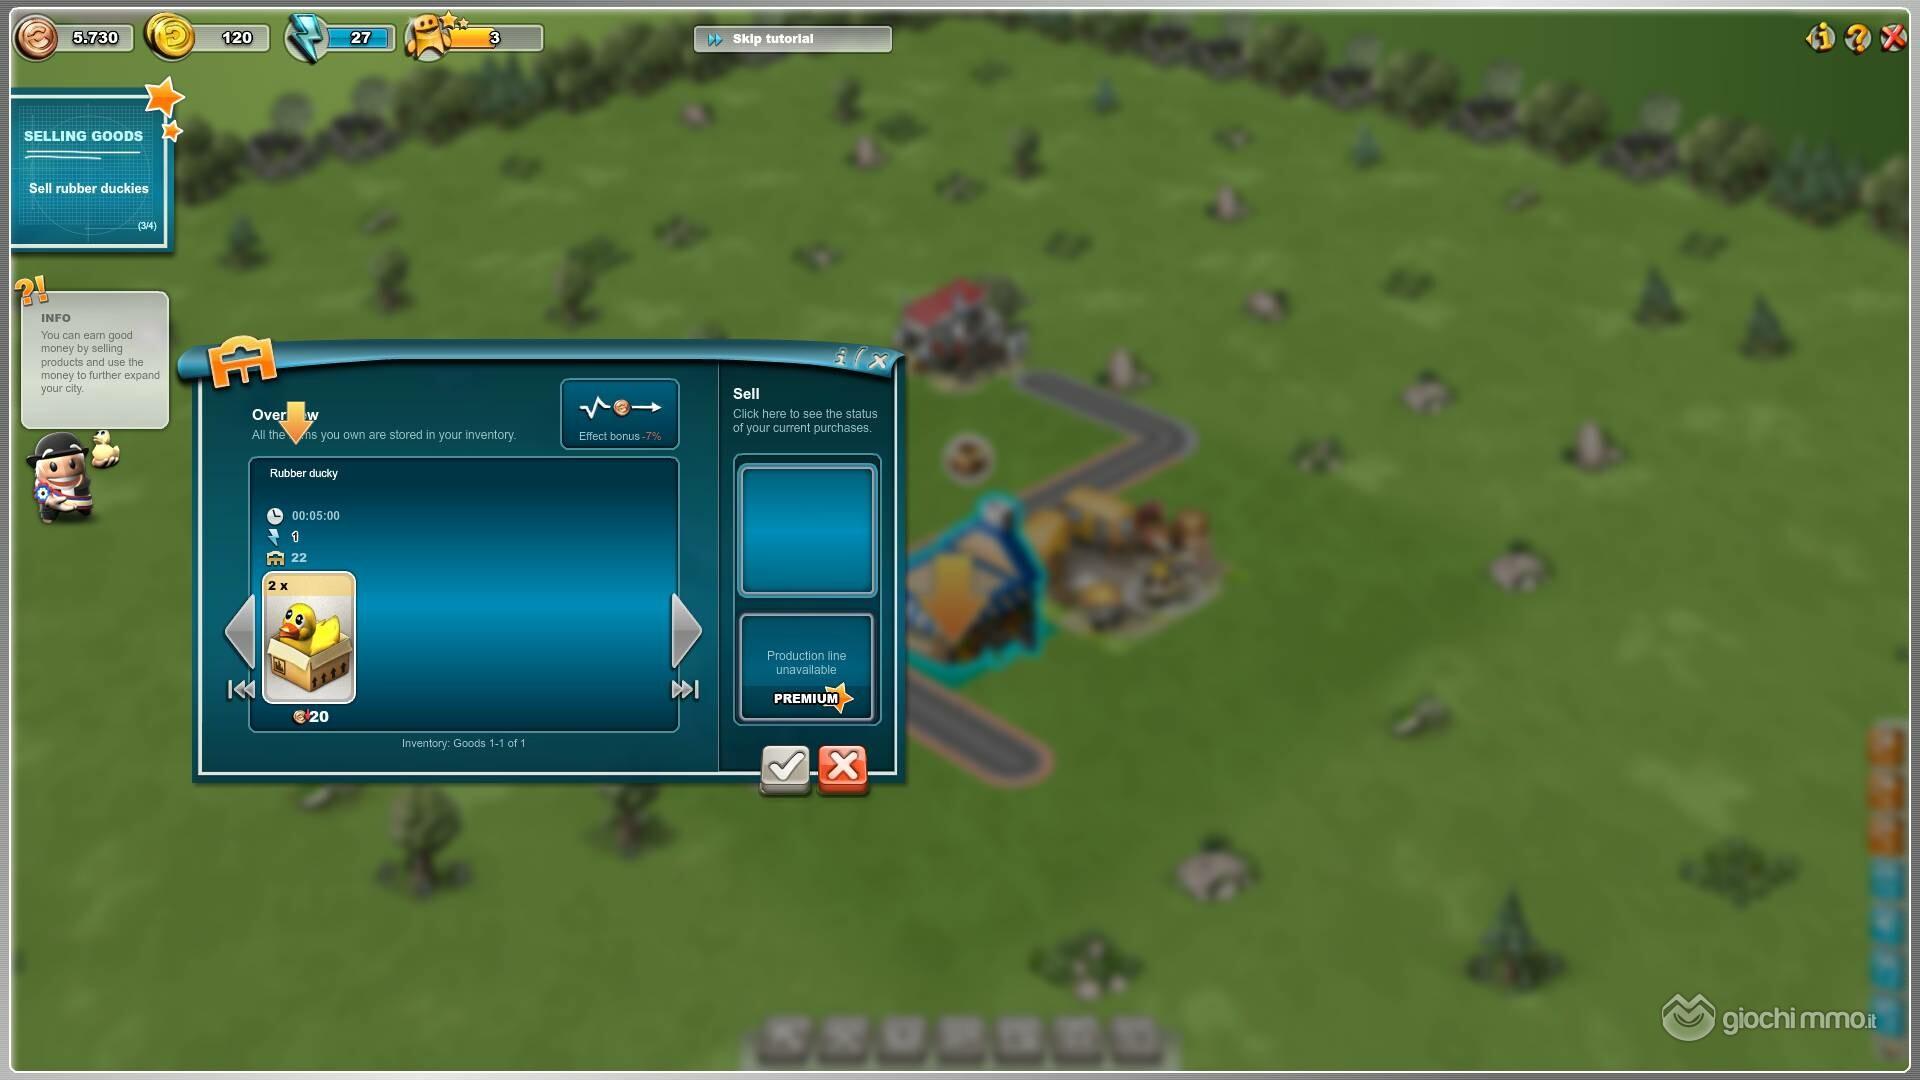 Clicca sull'immagine per ingrandirlaNome:   Ramacity screen12.jpgVisite: 69Dimensione:   186.0 KBID: 8657